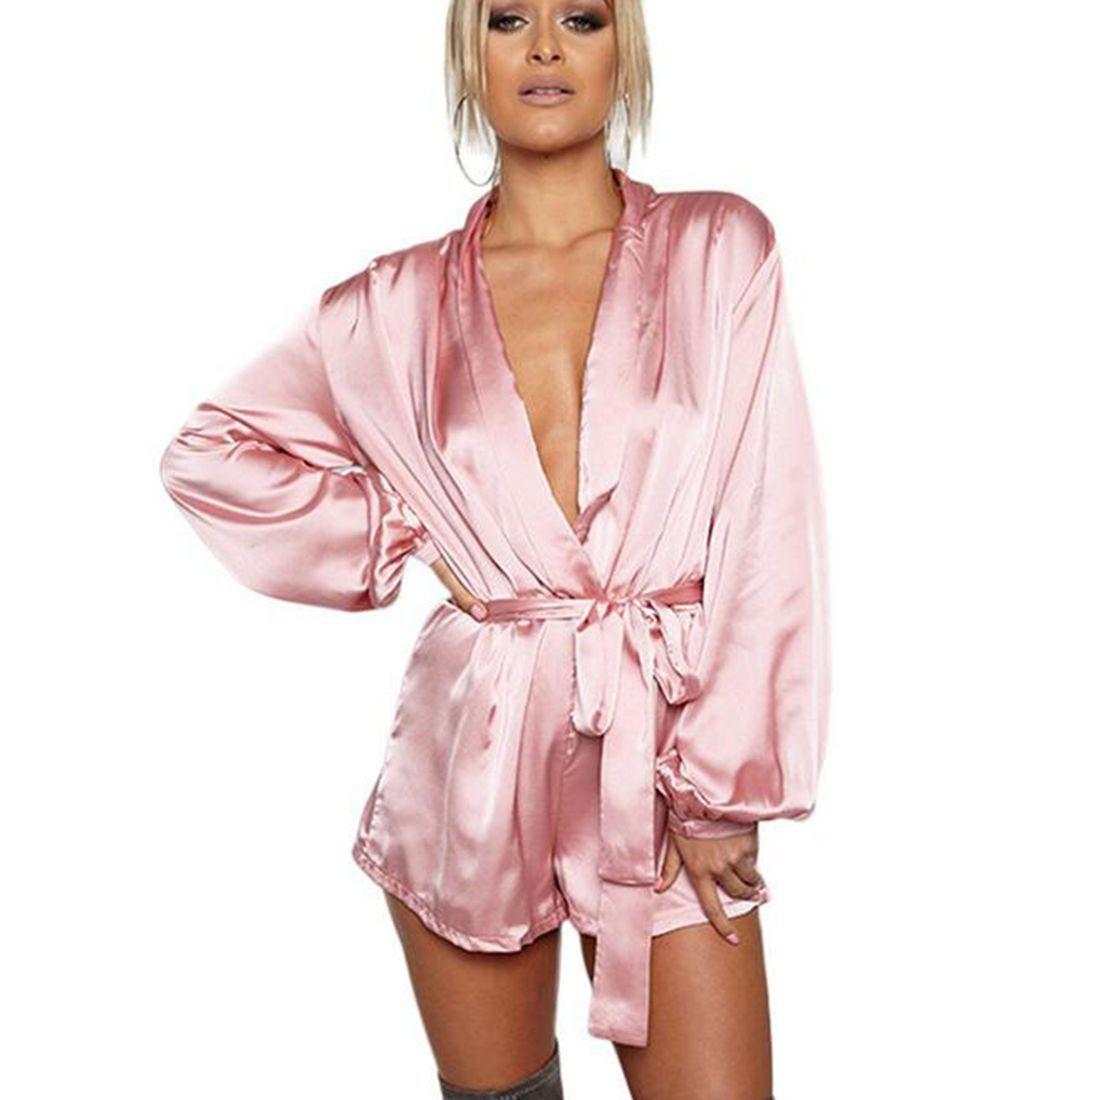 0c59d383a93 Elegant Lady V Neck Jumpsuit Fashion Pink Blush Silk Satin Short Romper  Playsuit